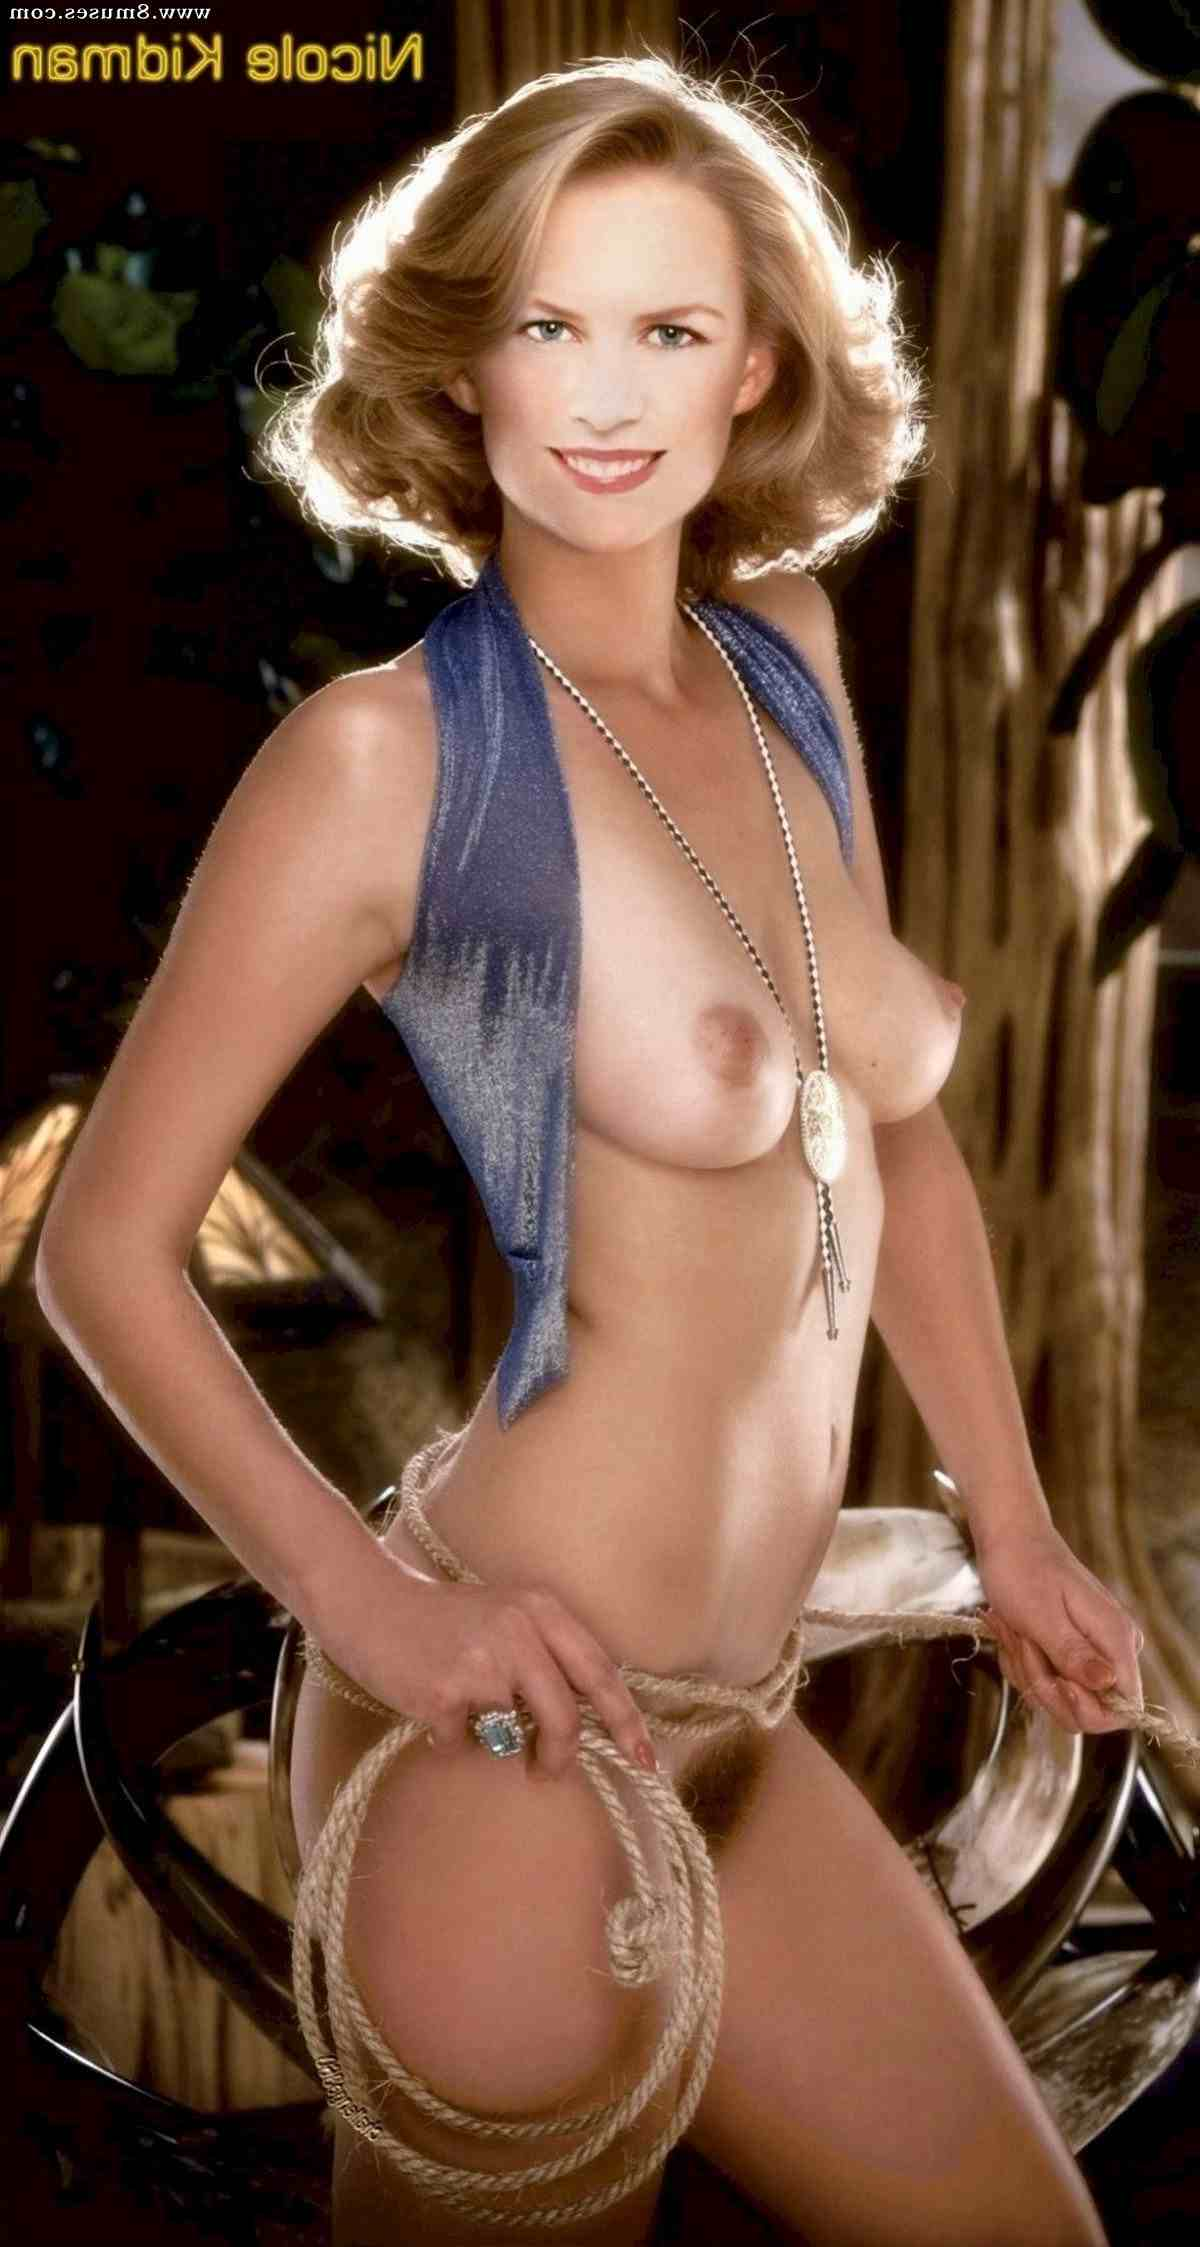 Fake-Celebrities-Sex-Pictures/Nicole-Kidman Nicole_Kidman__8muses_-_Sex_and_Porn_Comics_810.jpg